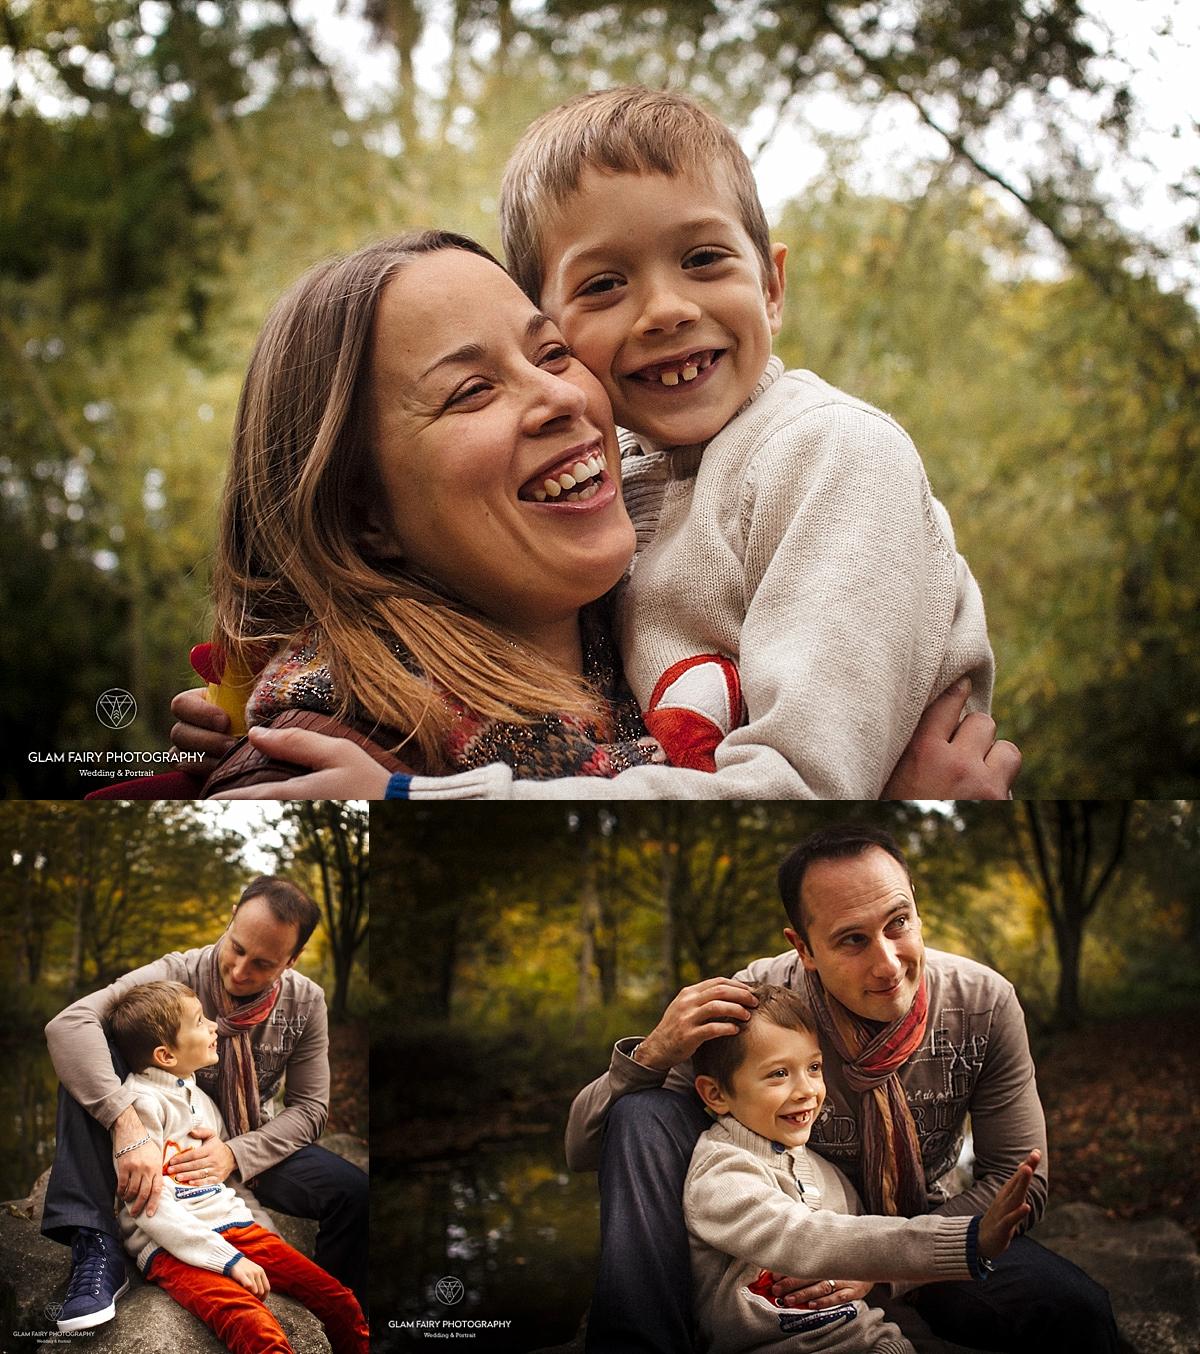 GlamFairyPhotography-mini-session-en-famille-a-vincennes-cecile_0002